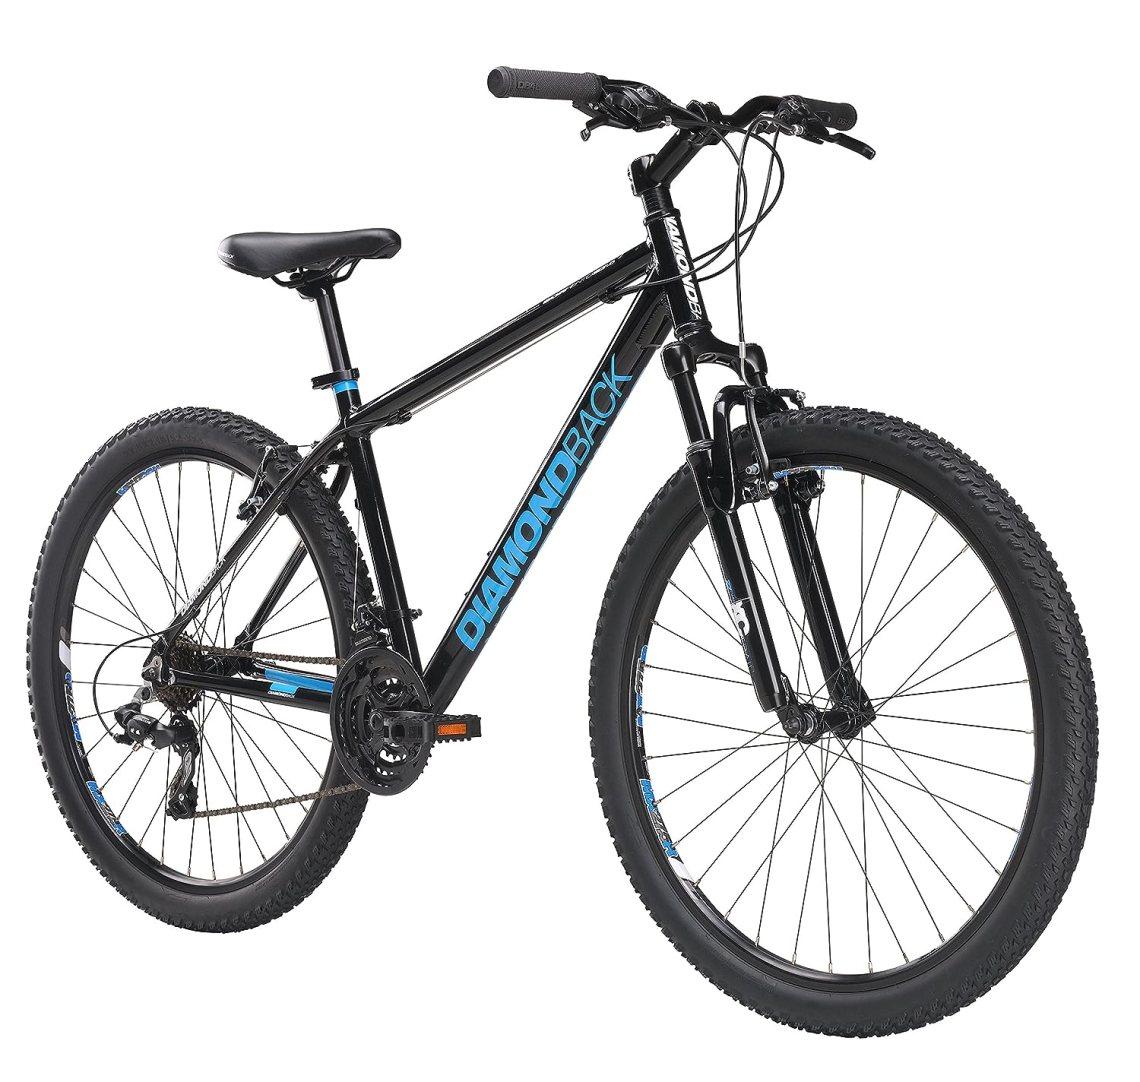 Image Result For Cheap Full Suspension Mountain Bike